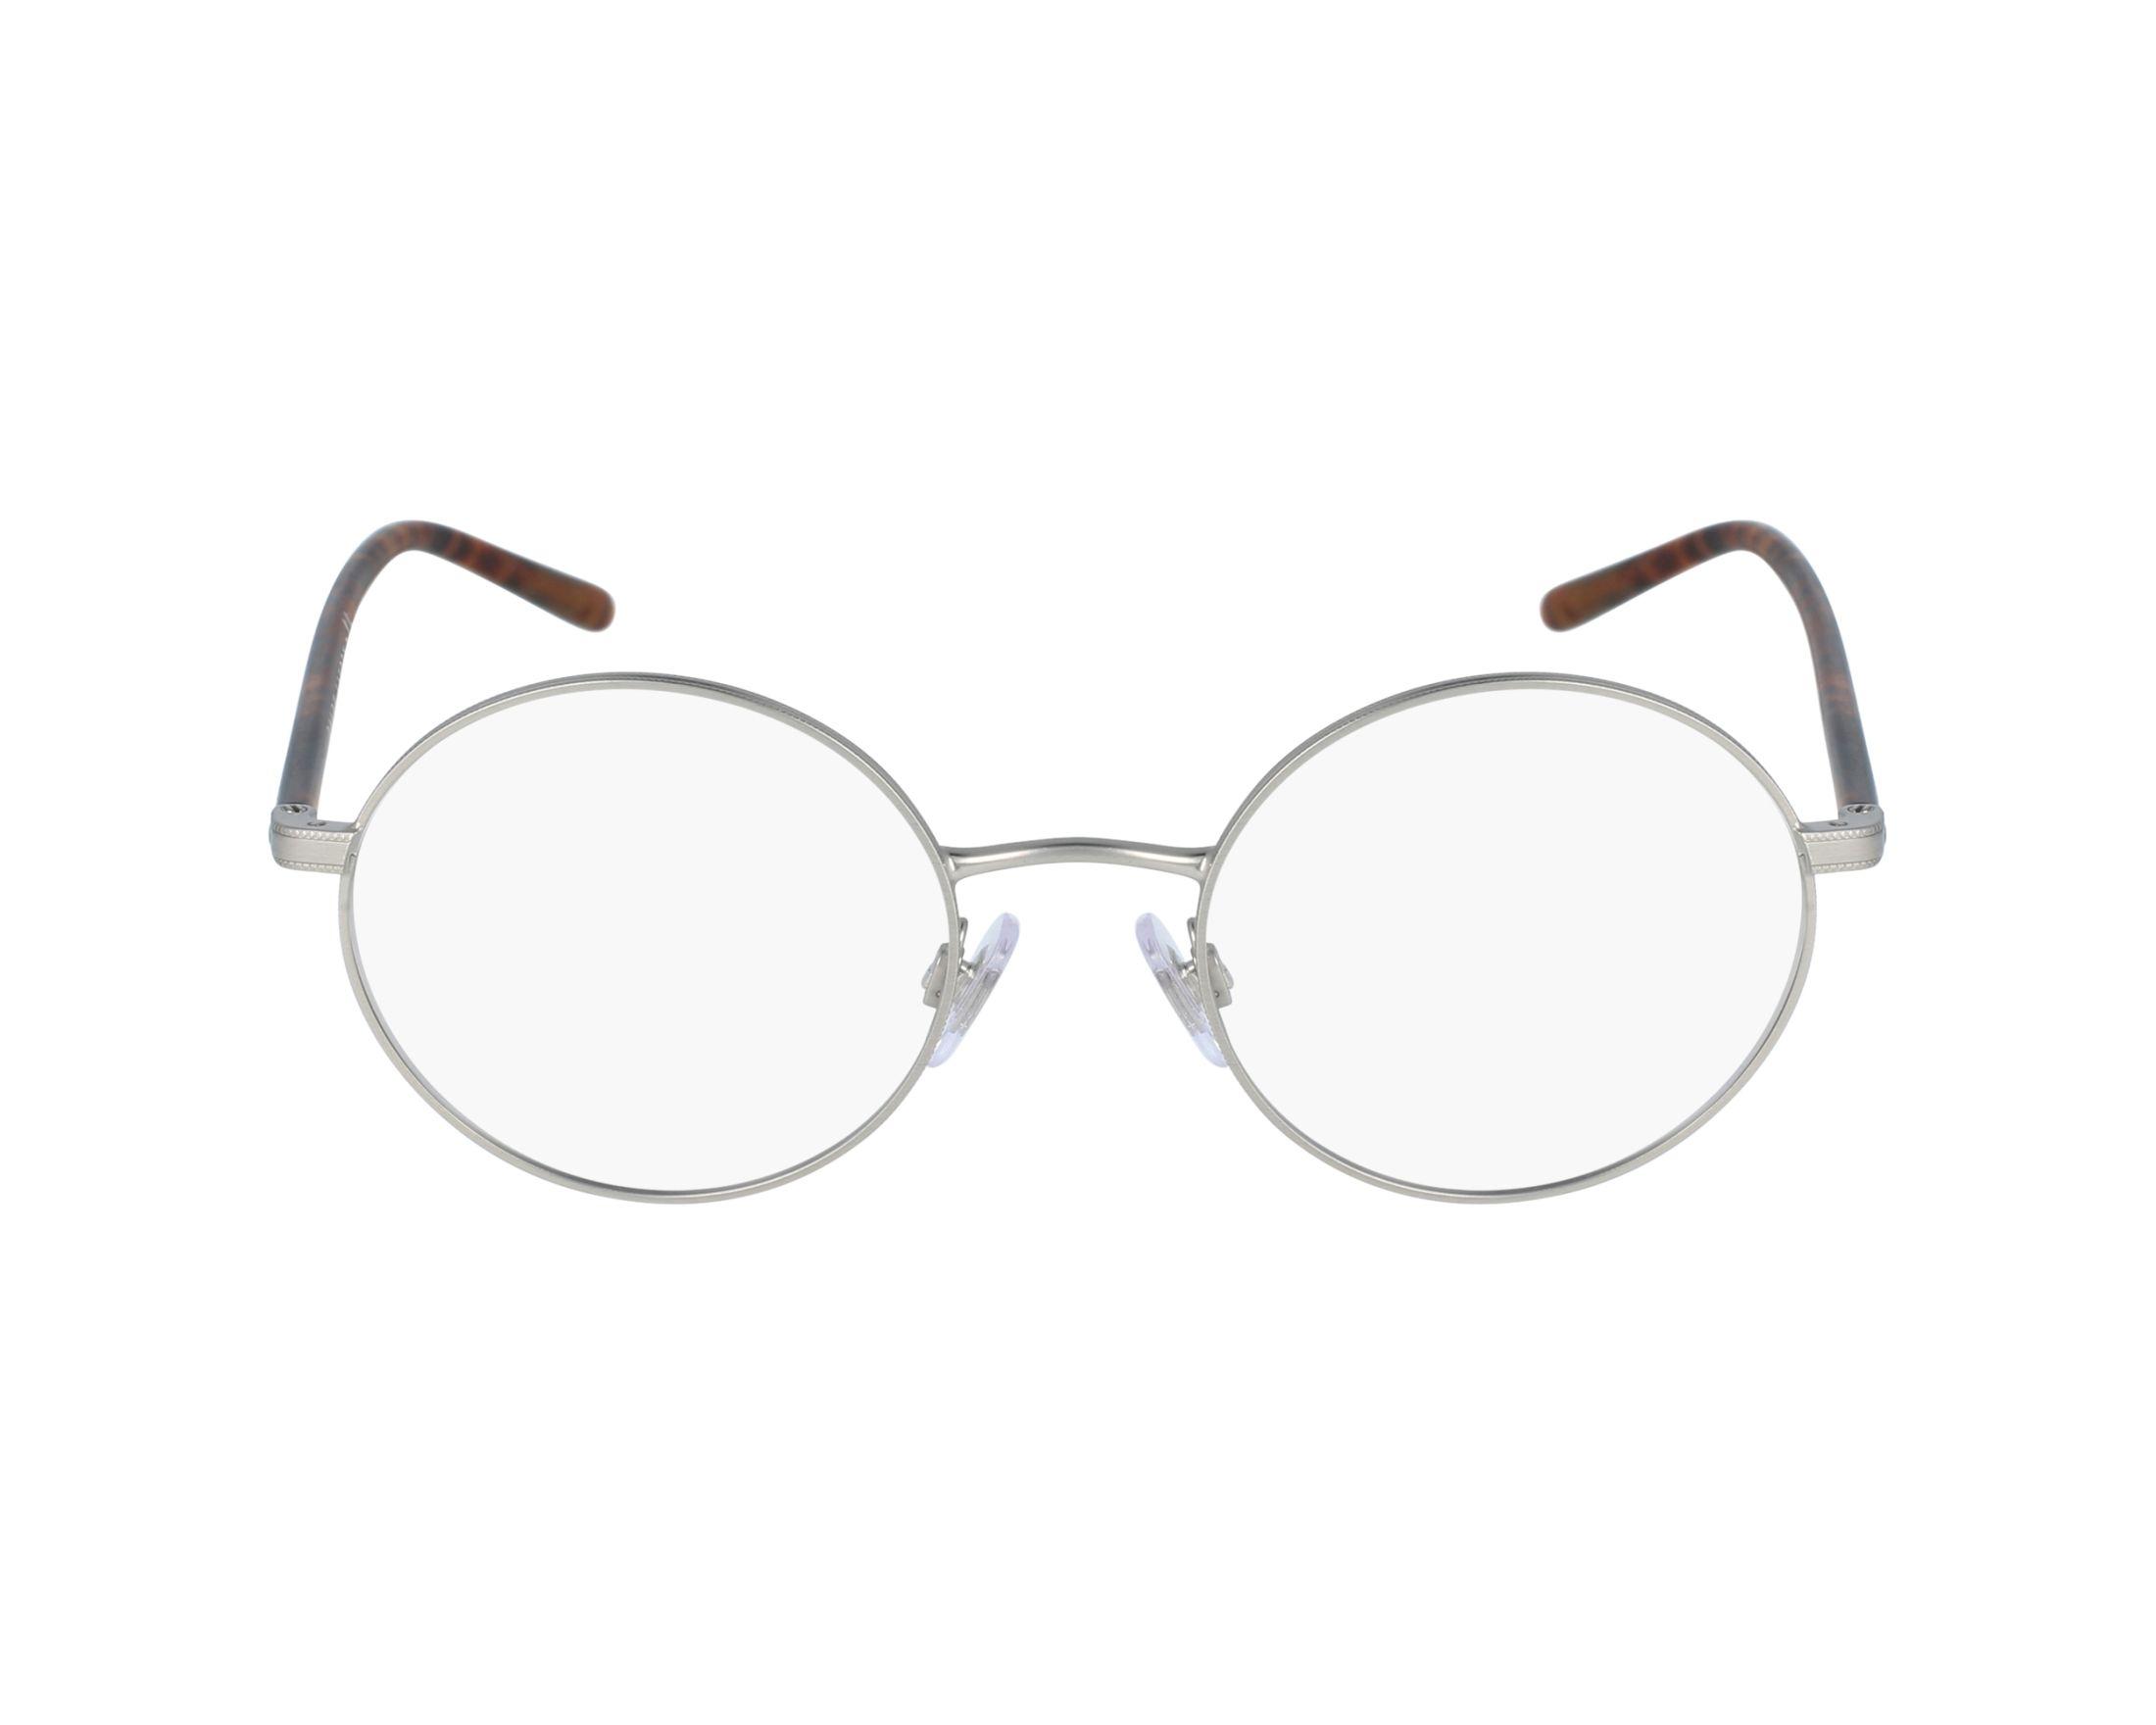 Glasses 52161 3ec48 Lauren Low Price Polo Havana Ralph 8nvm0OwN